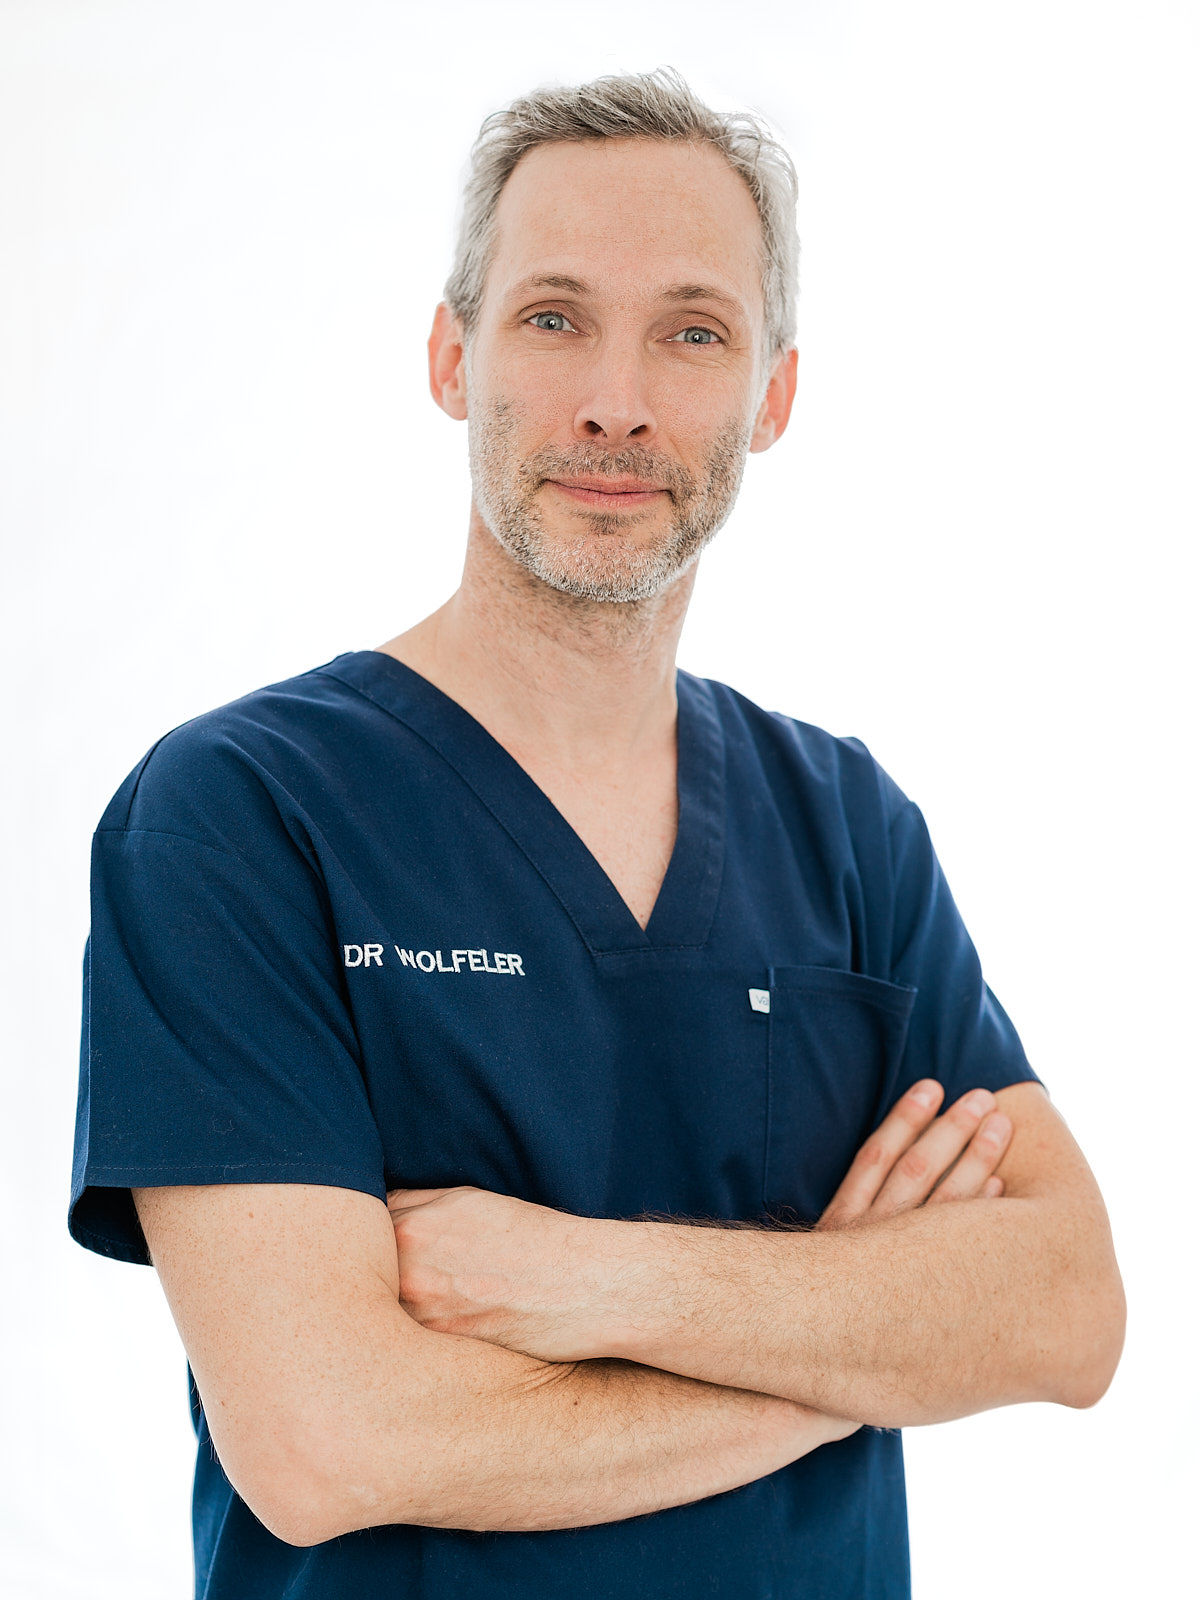 Jean-David WOLFELER